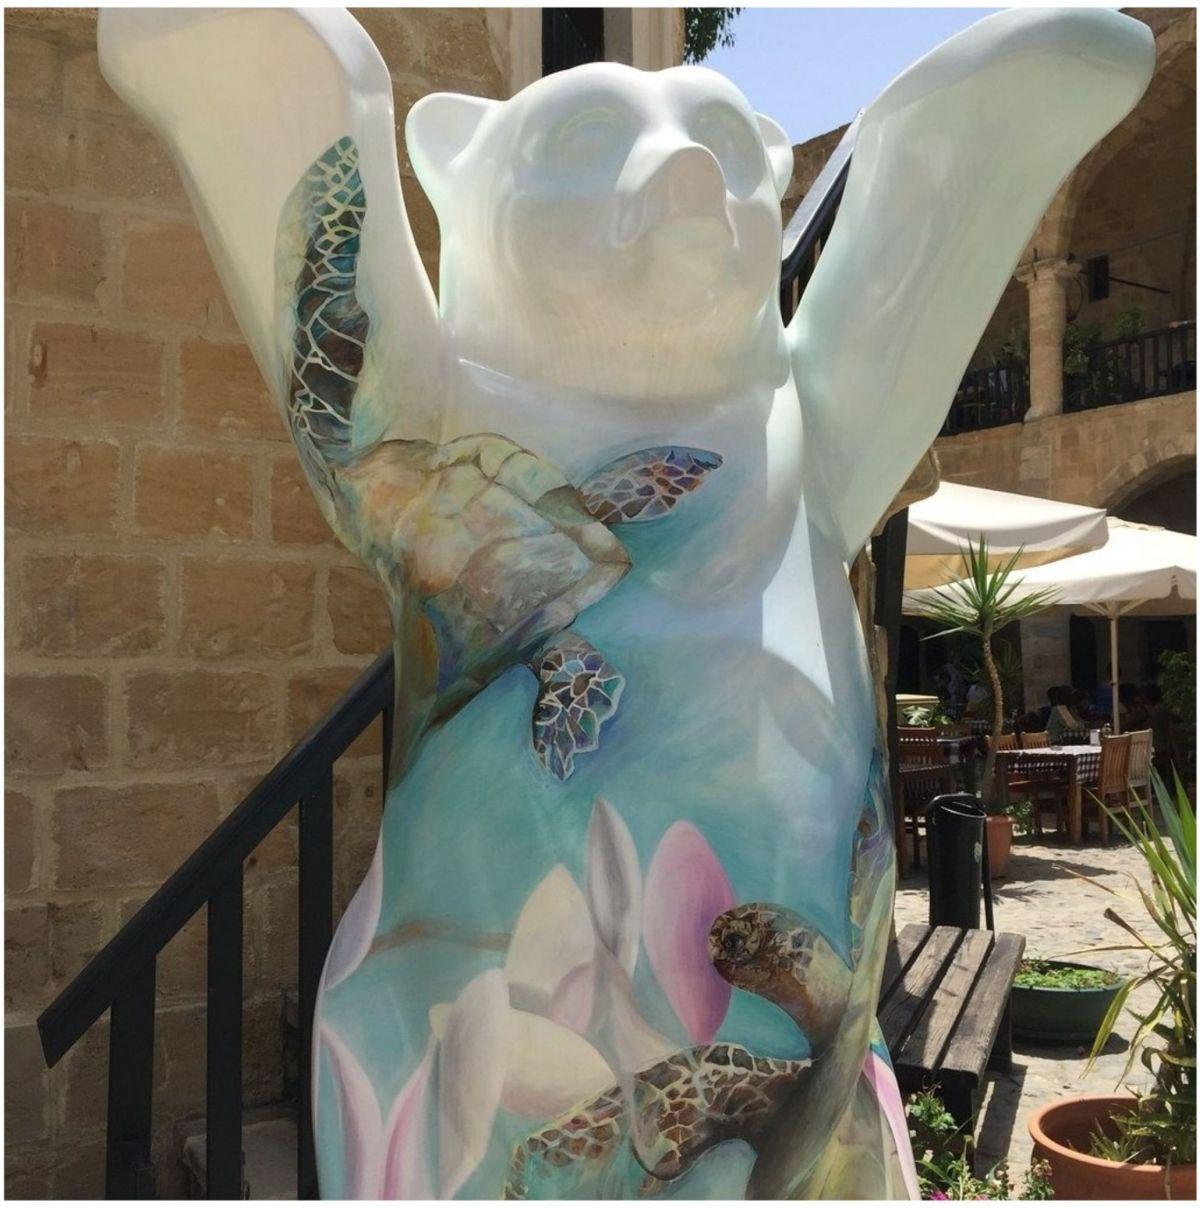 Караван-Сарай Бюйюк-Хан, Никосия, Кипр, статуэтка берлинский медведь с кипрскими черепахами